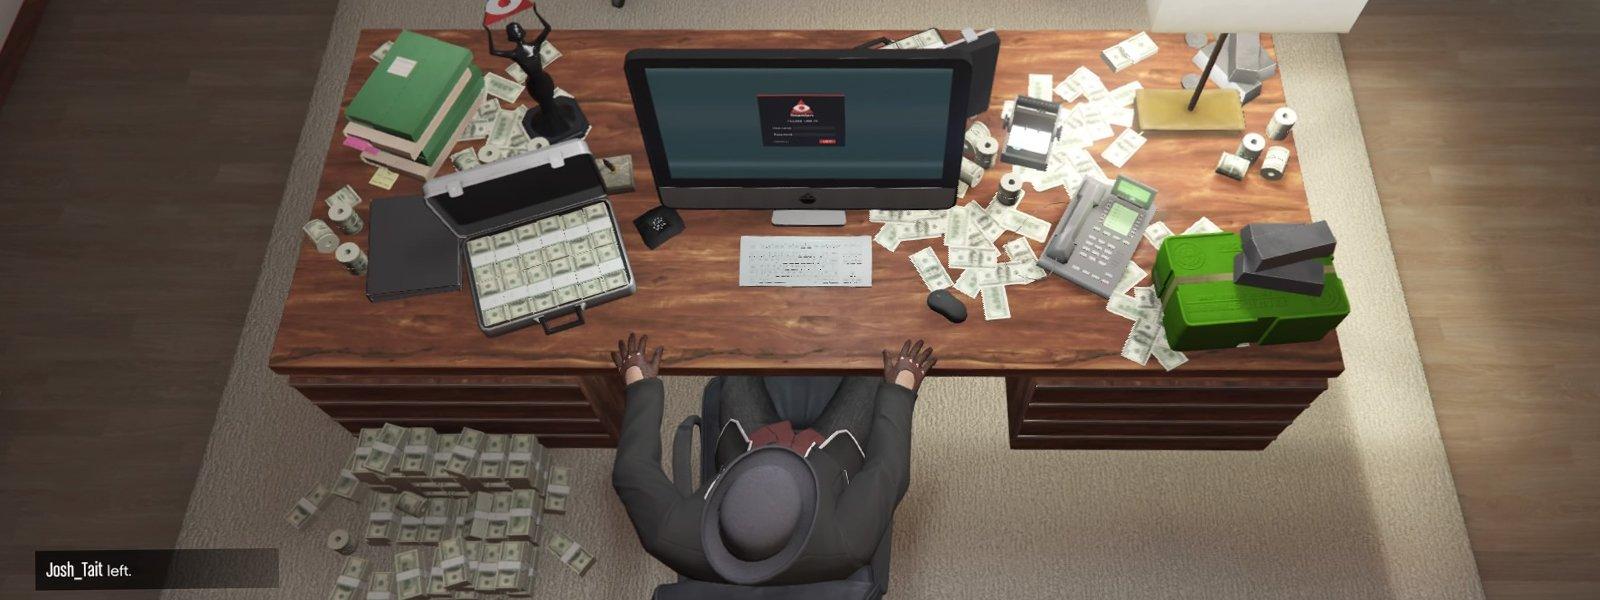 How to Make GTA Online Money Fast for Free | FinalBoss